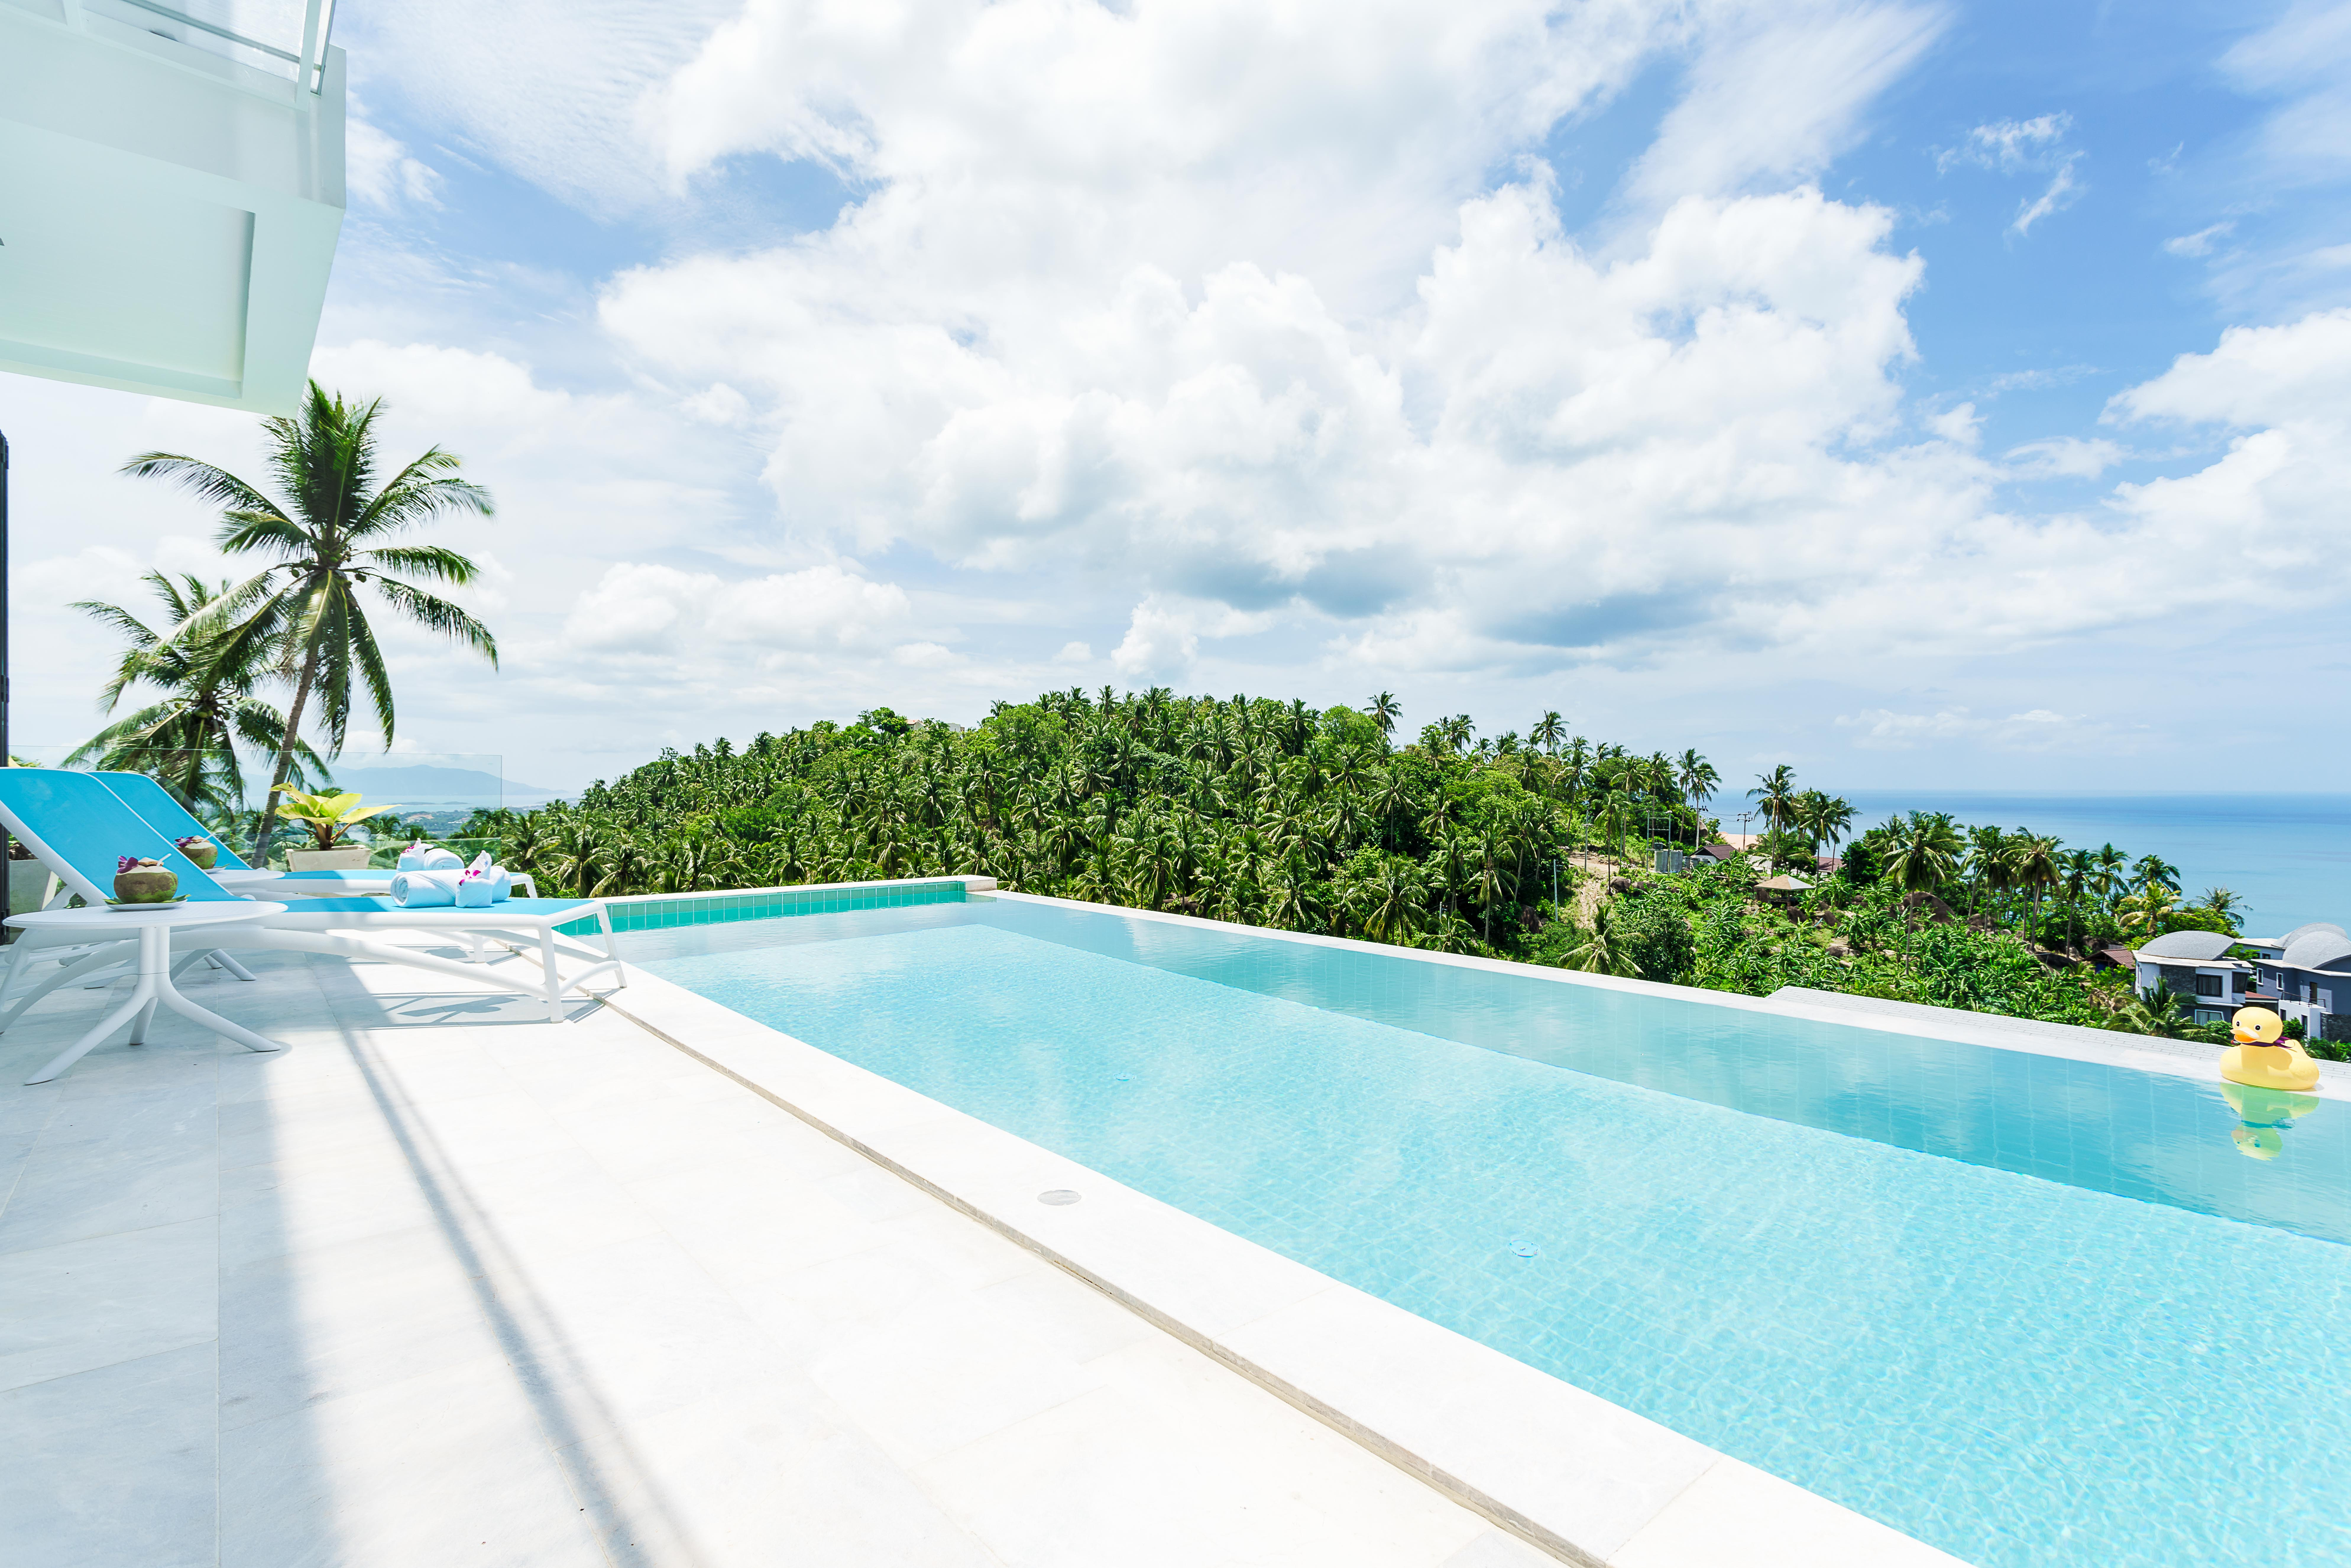 Villa melo koh samui for Koh tao cabana koi pool villa